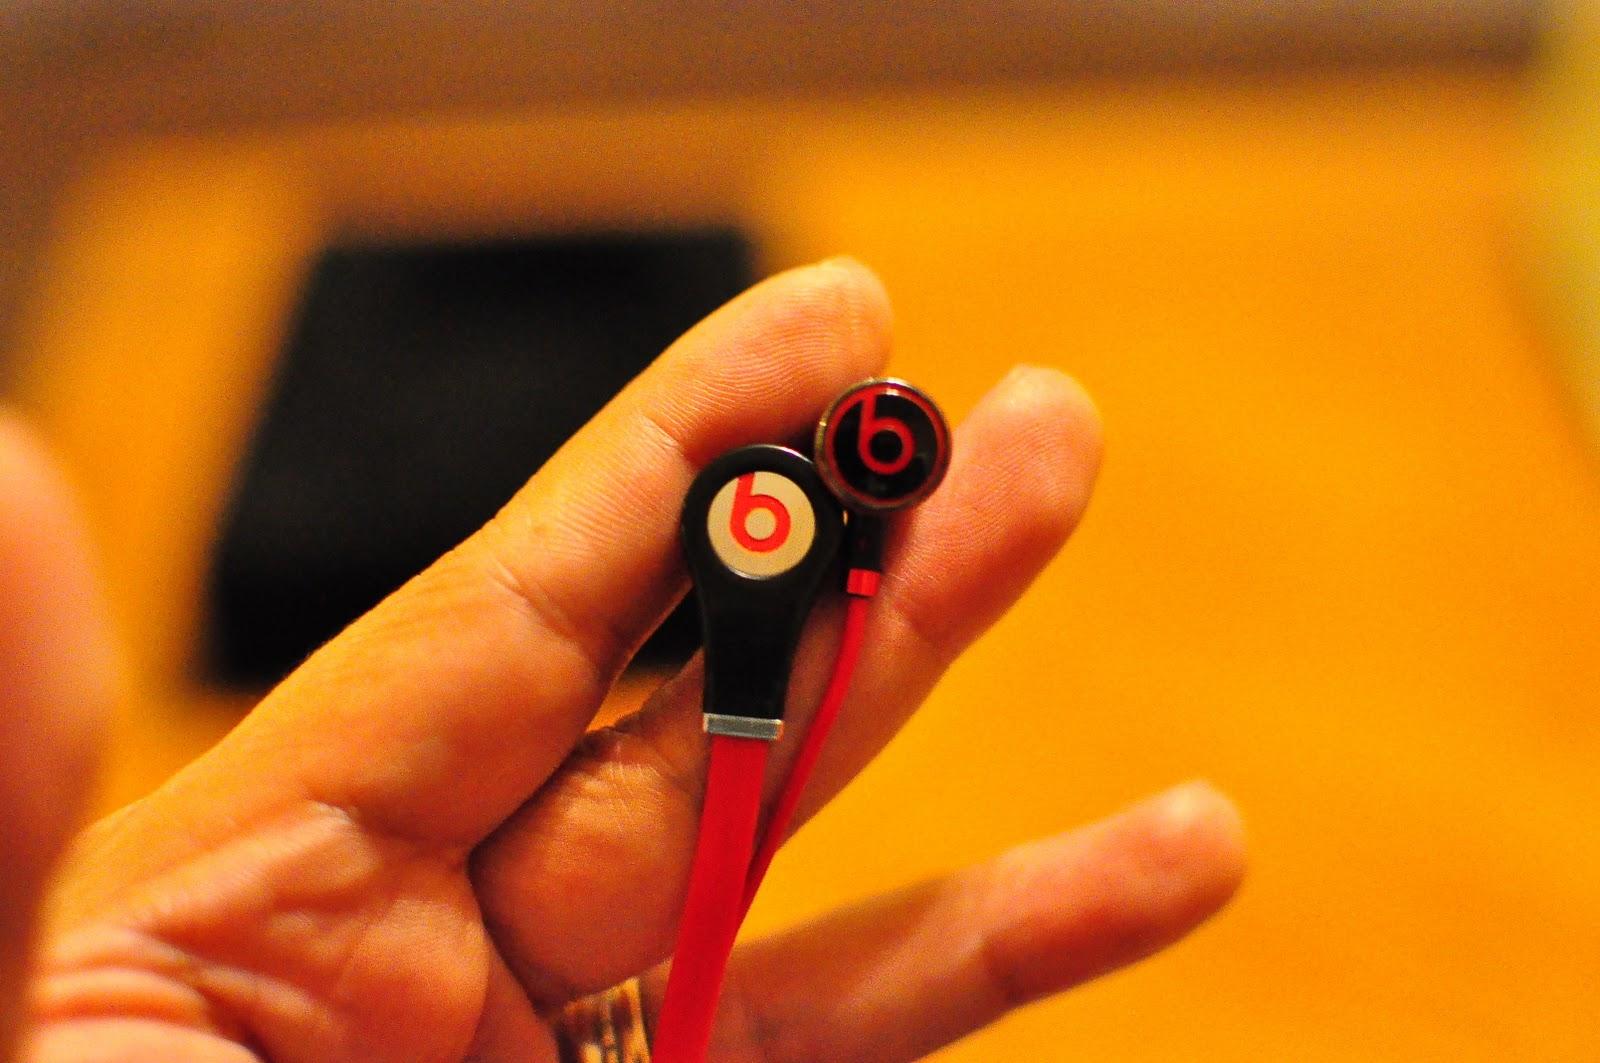 Cheap Panasonic ErgoFit In-Ear Earbud Headphones With Mic/Controller - 3 Pack (Black)